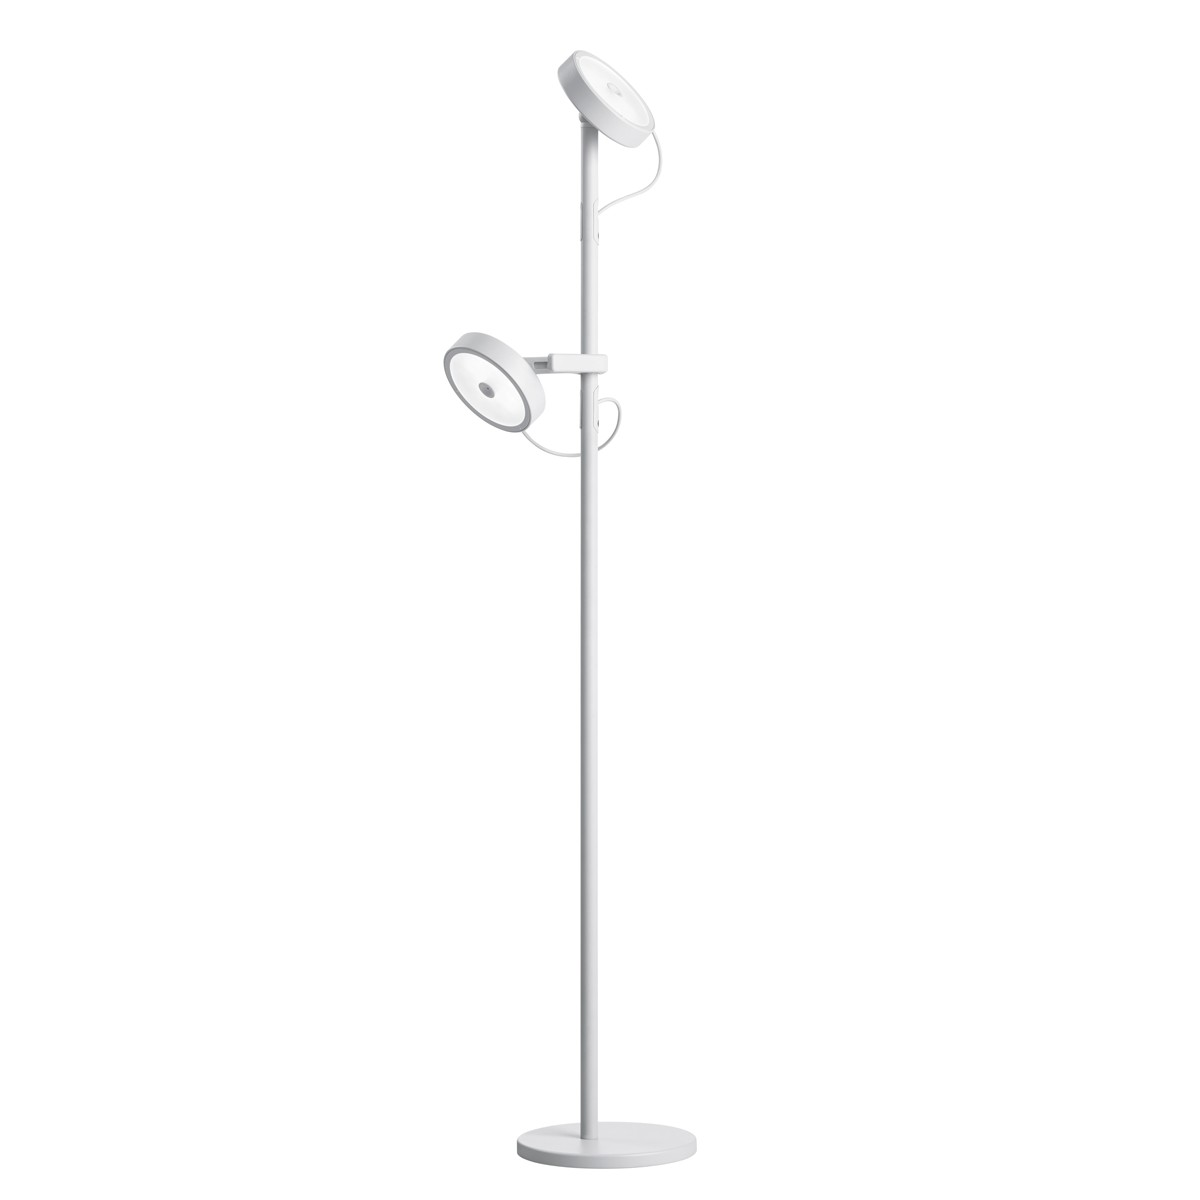 Belux U-Turn-12 LED Stehleuchte, telegrau